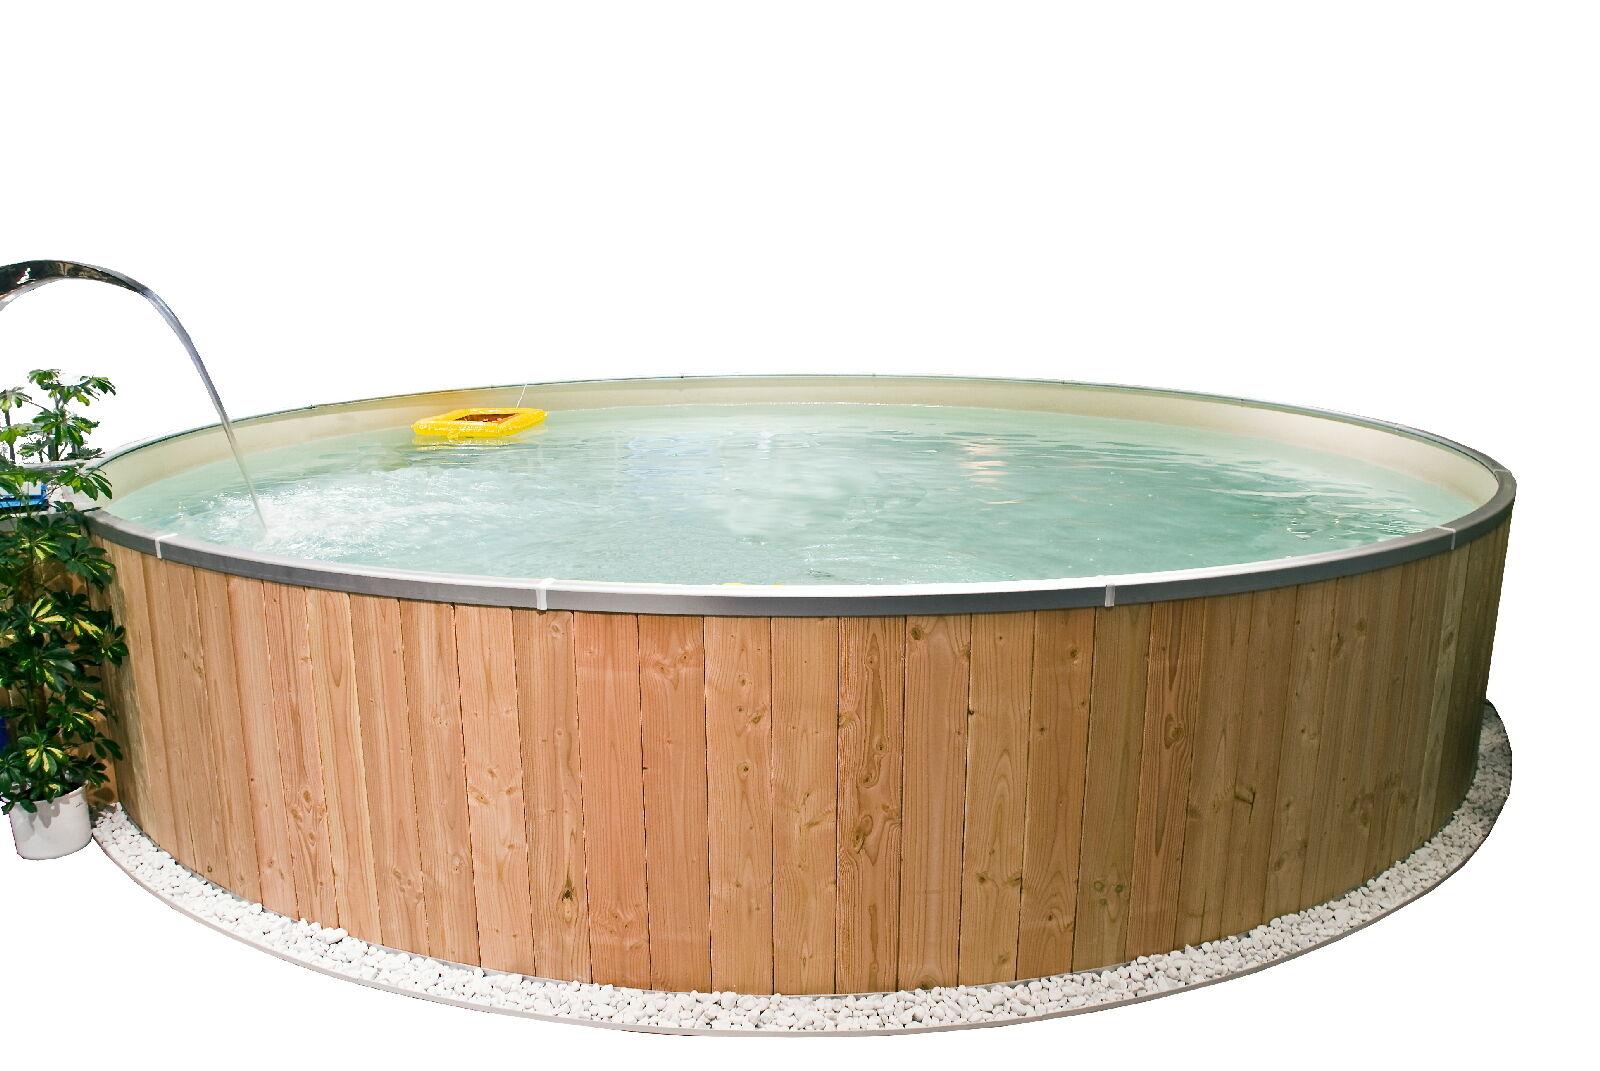 Bestway stahlwandpool set oval 39 hydrium 39 500x360x120 for Stahlwandpool rund steinoptik